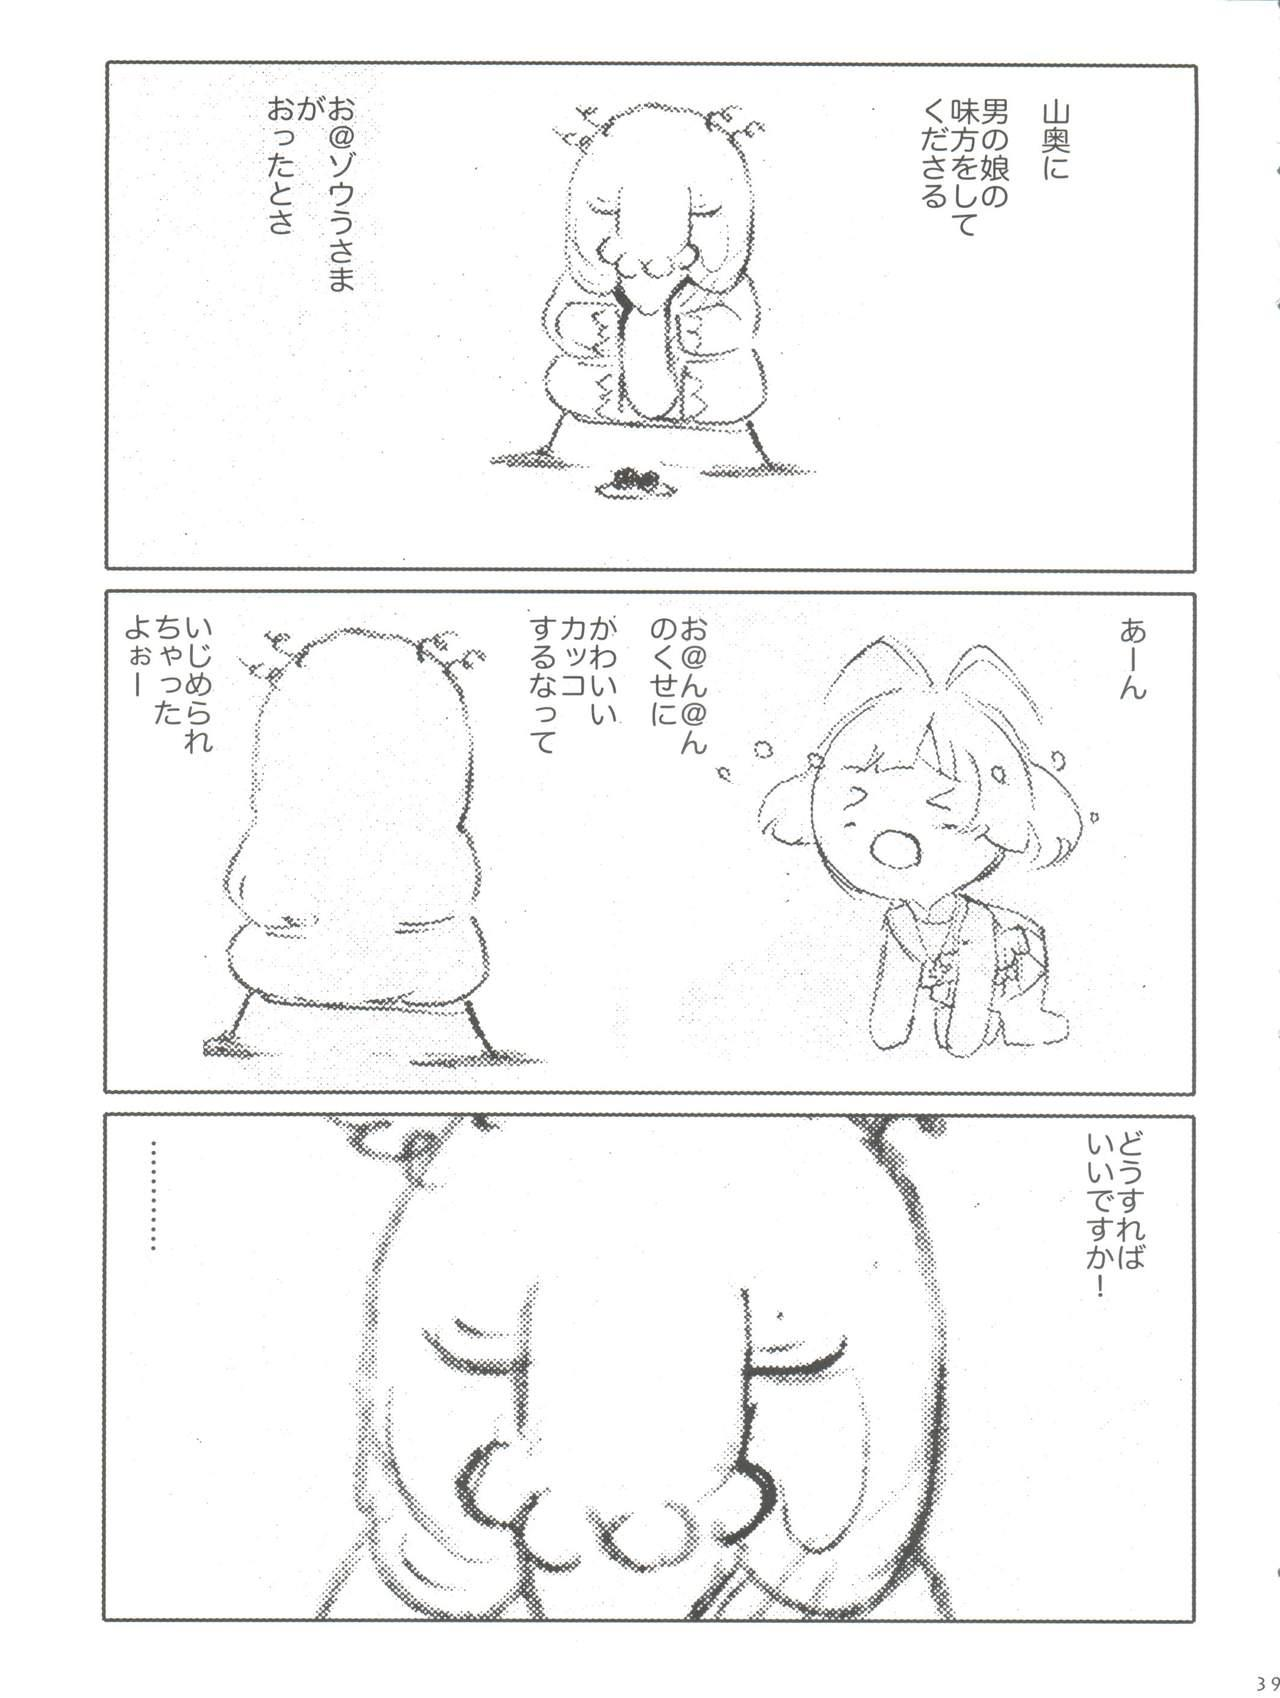 Ryo-chin Land 38